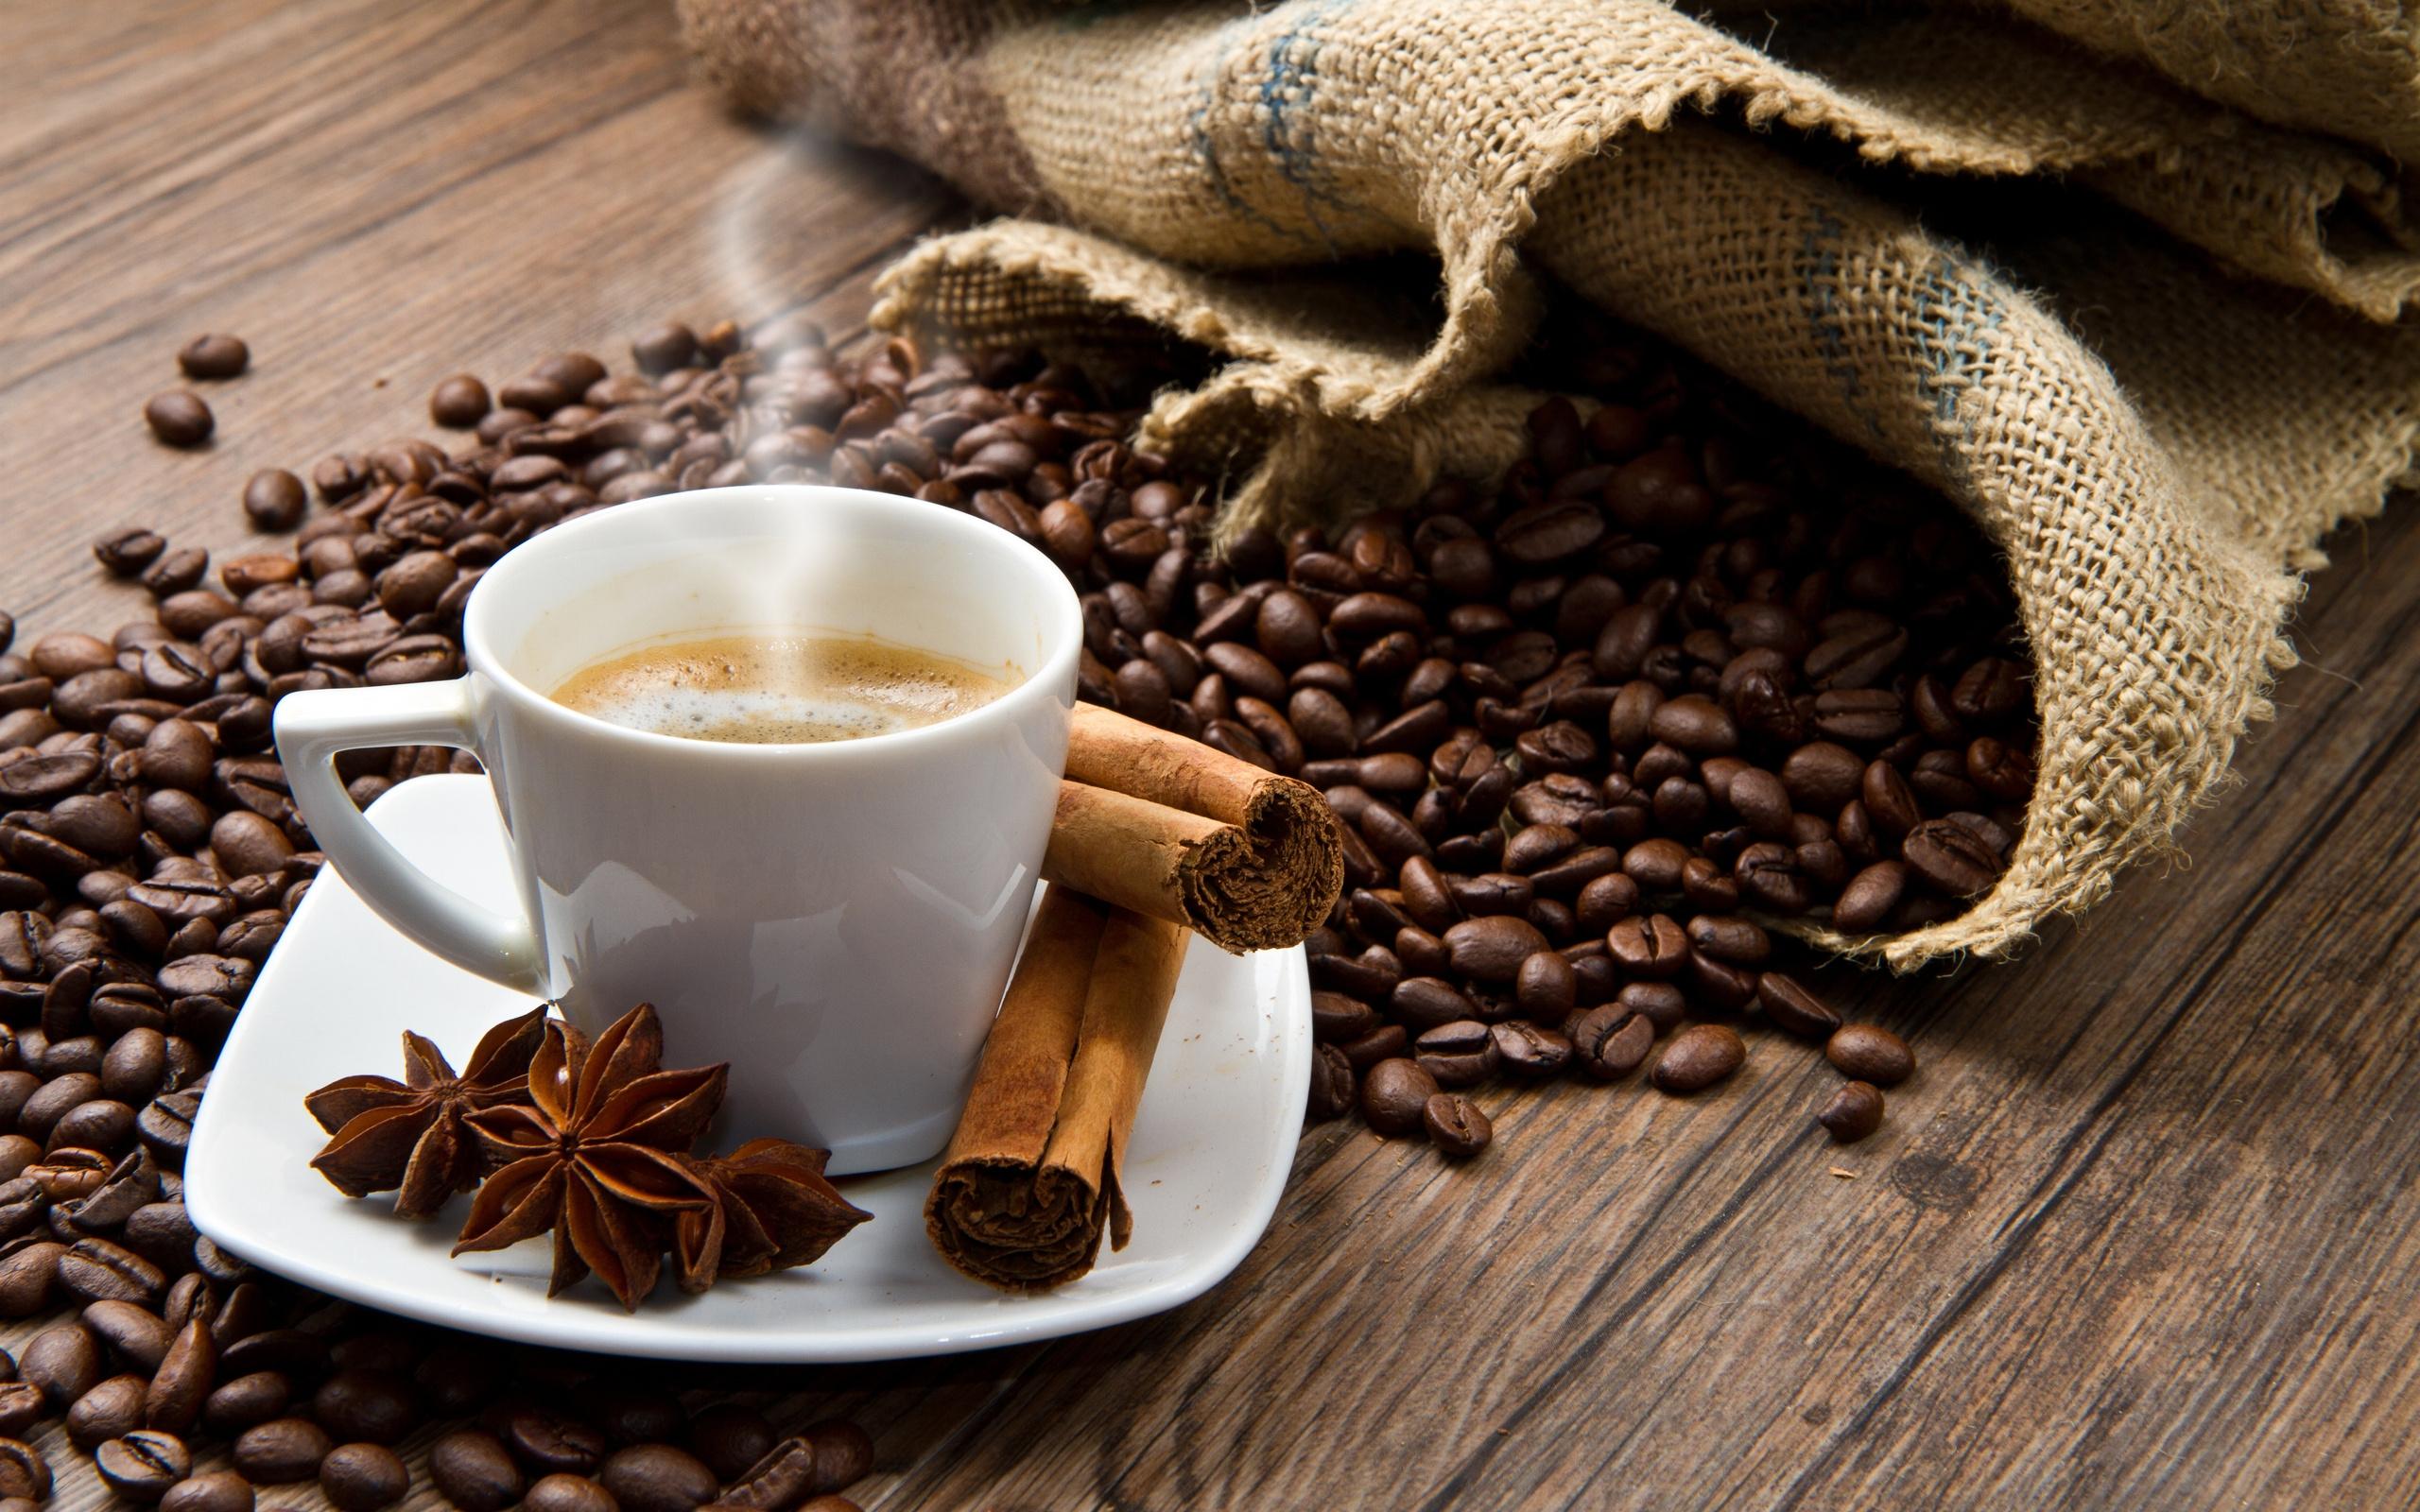 Hintergrundbilder : Kaffee, Getränk, Tasse, Kaffeebohnen, Zimt ...